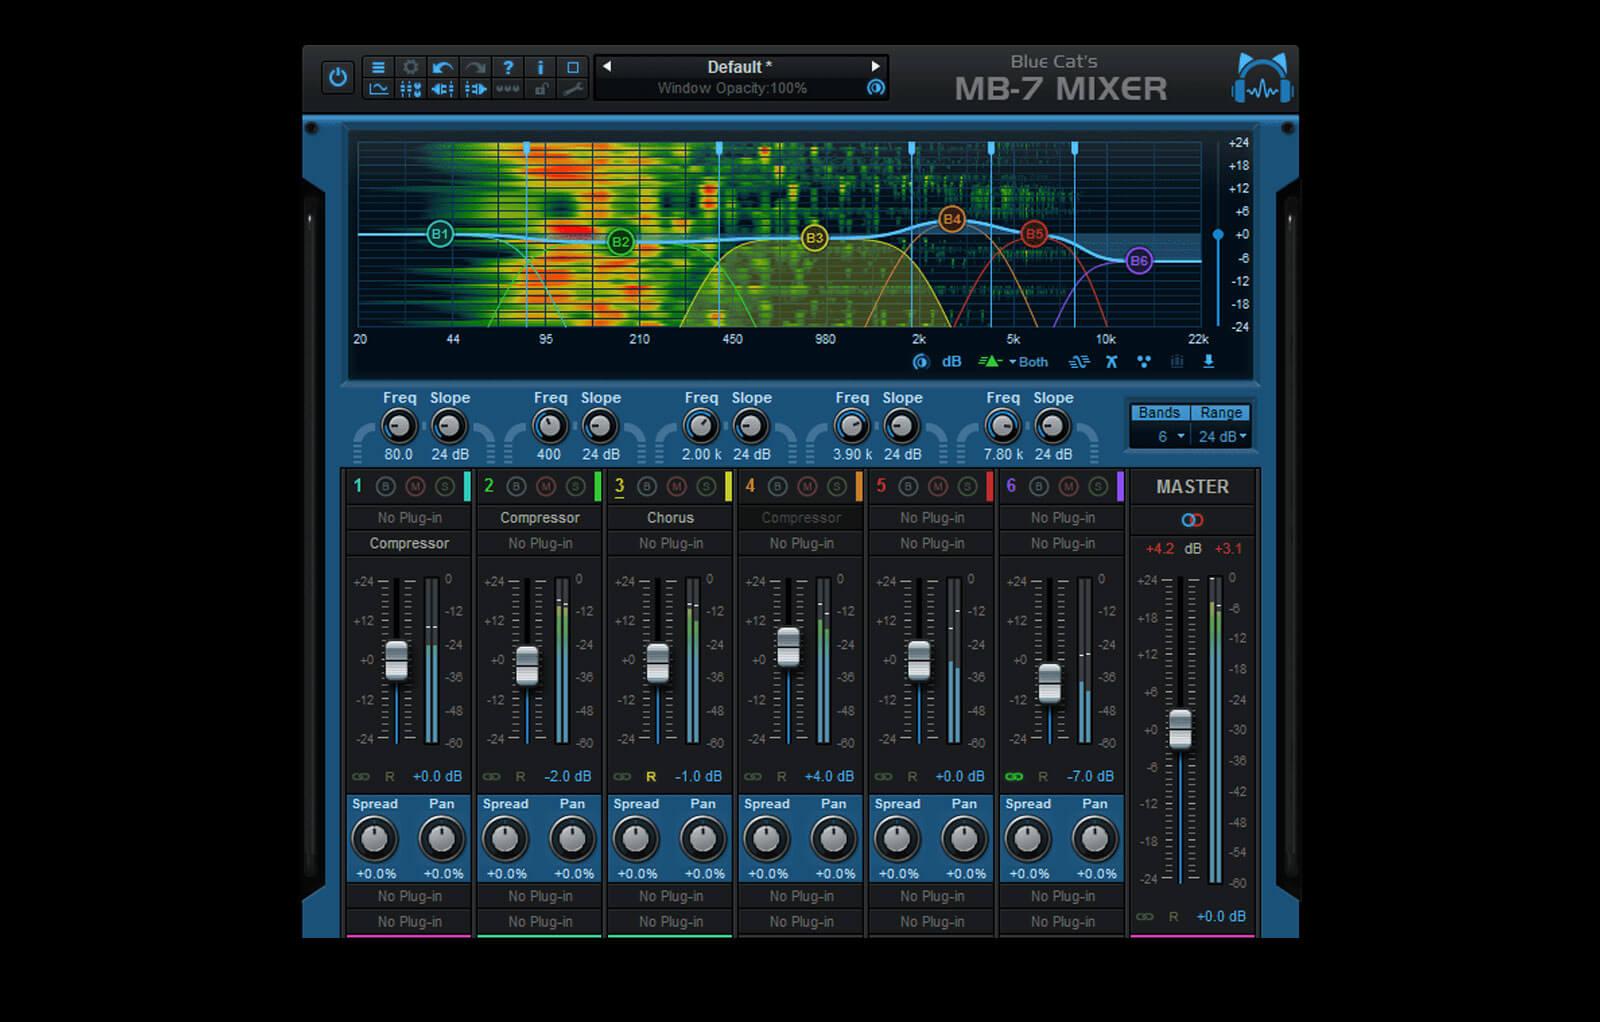 MB-7 Mixer